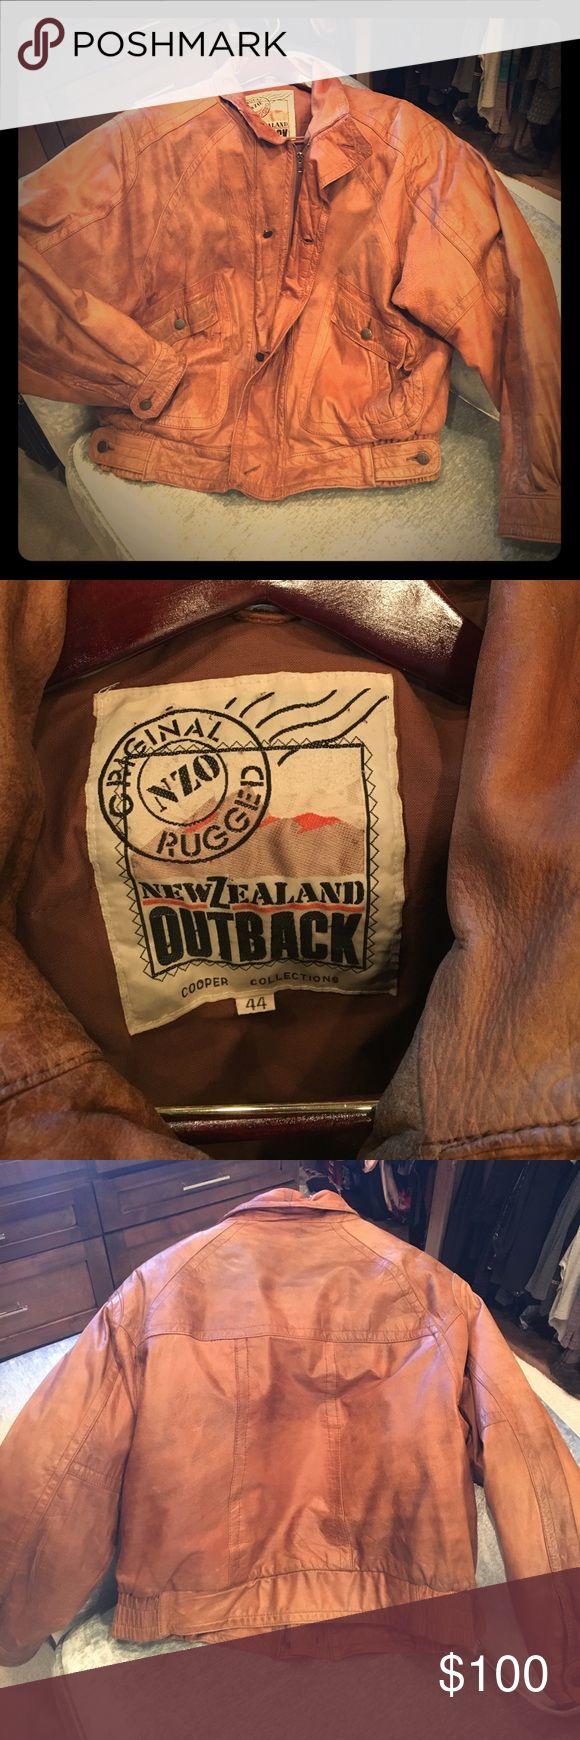 Rugged Men's outback leather bomber jacket Rugged Men's outback leather bomber jacket. Jackets & Coats Bomber & Varsity